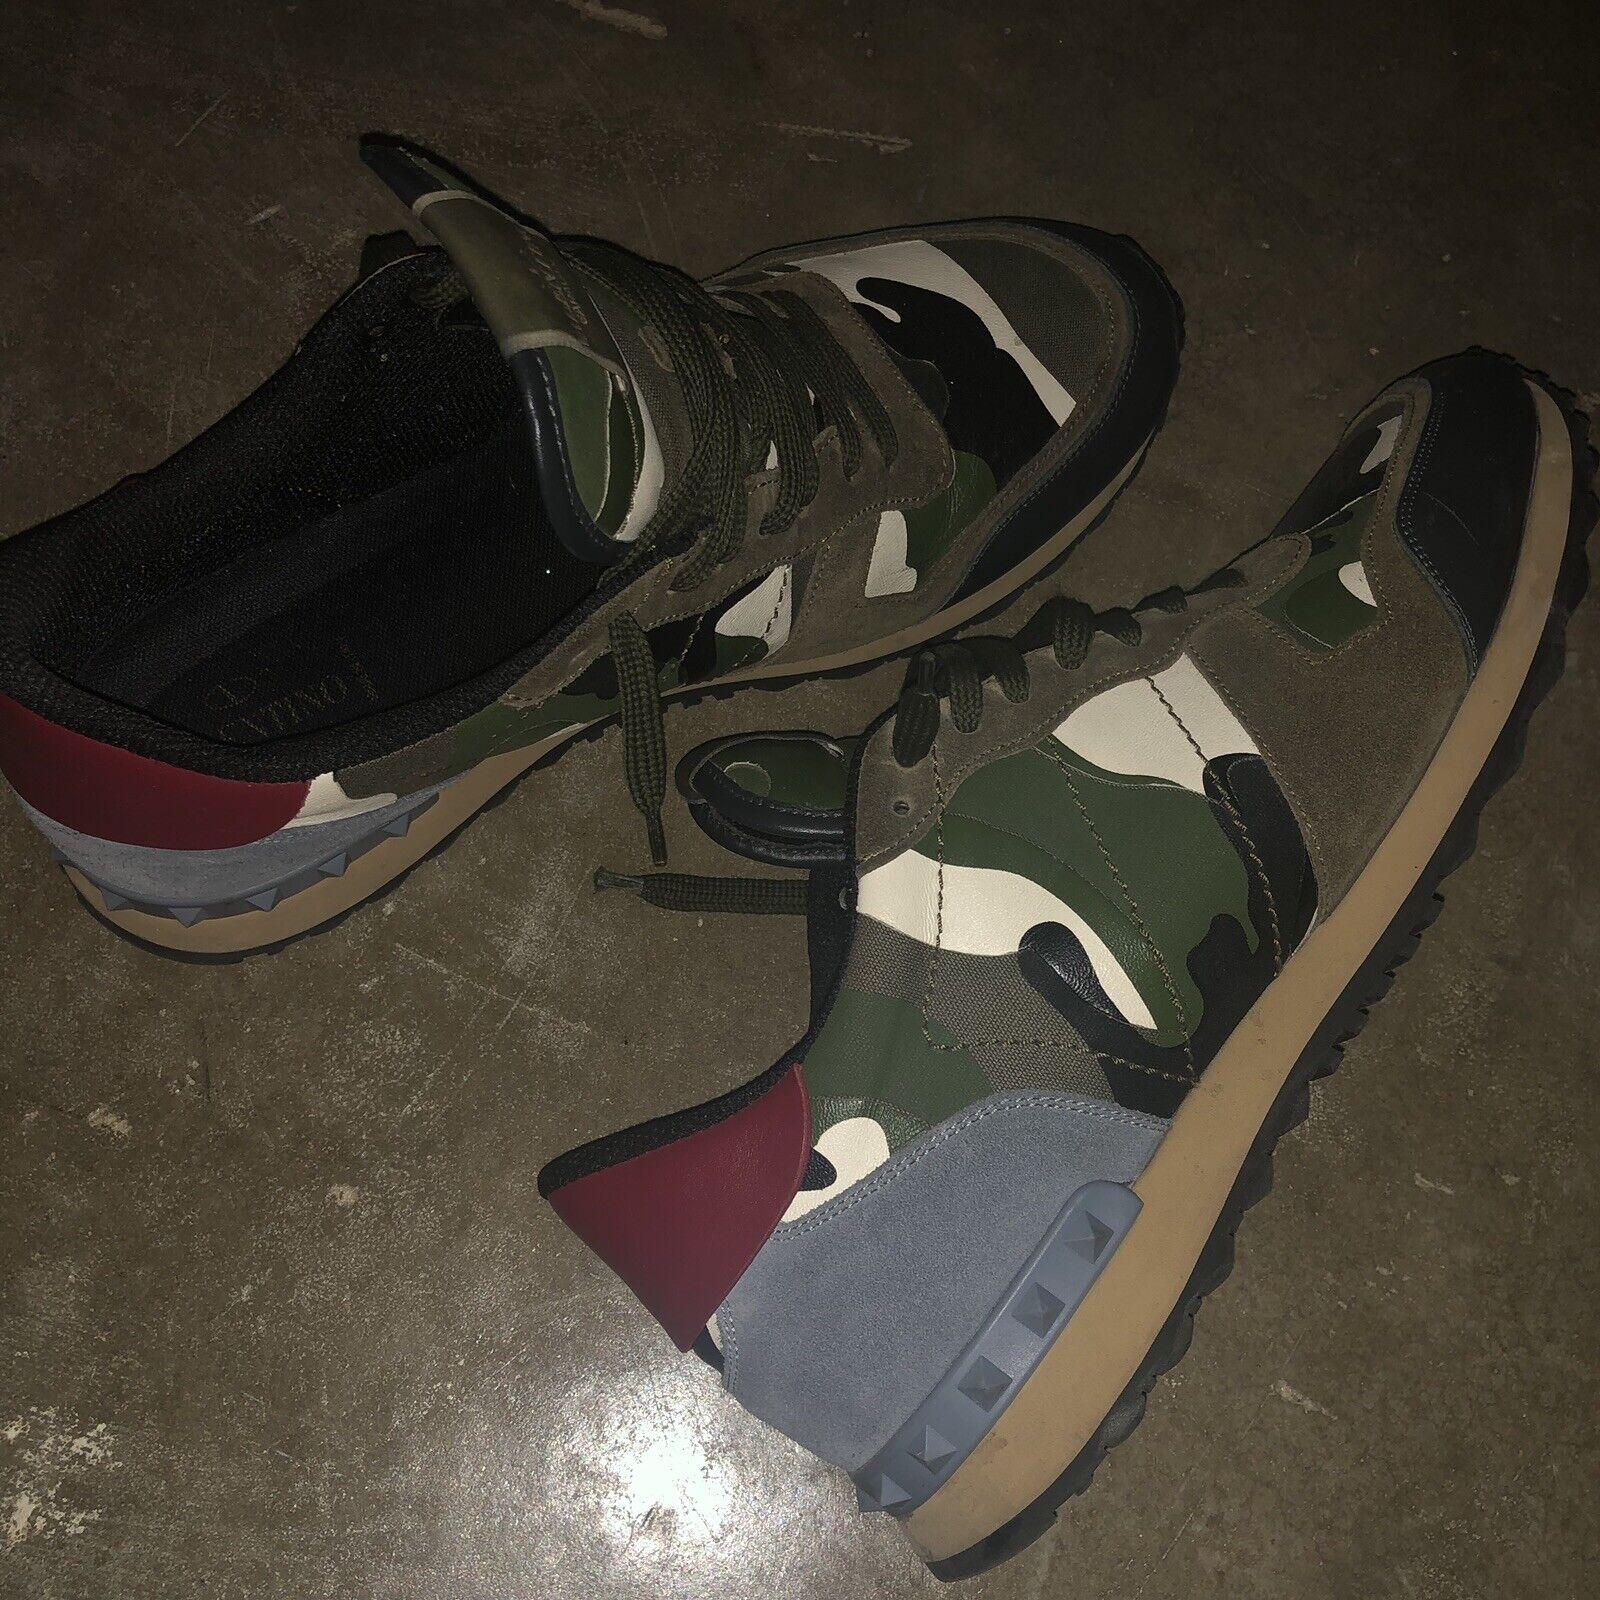 0d791c5aeb7c7 VALENTINO Camo Rock Runner Sneakers RARE Authentic 46 nrtygs924-new ...